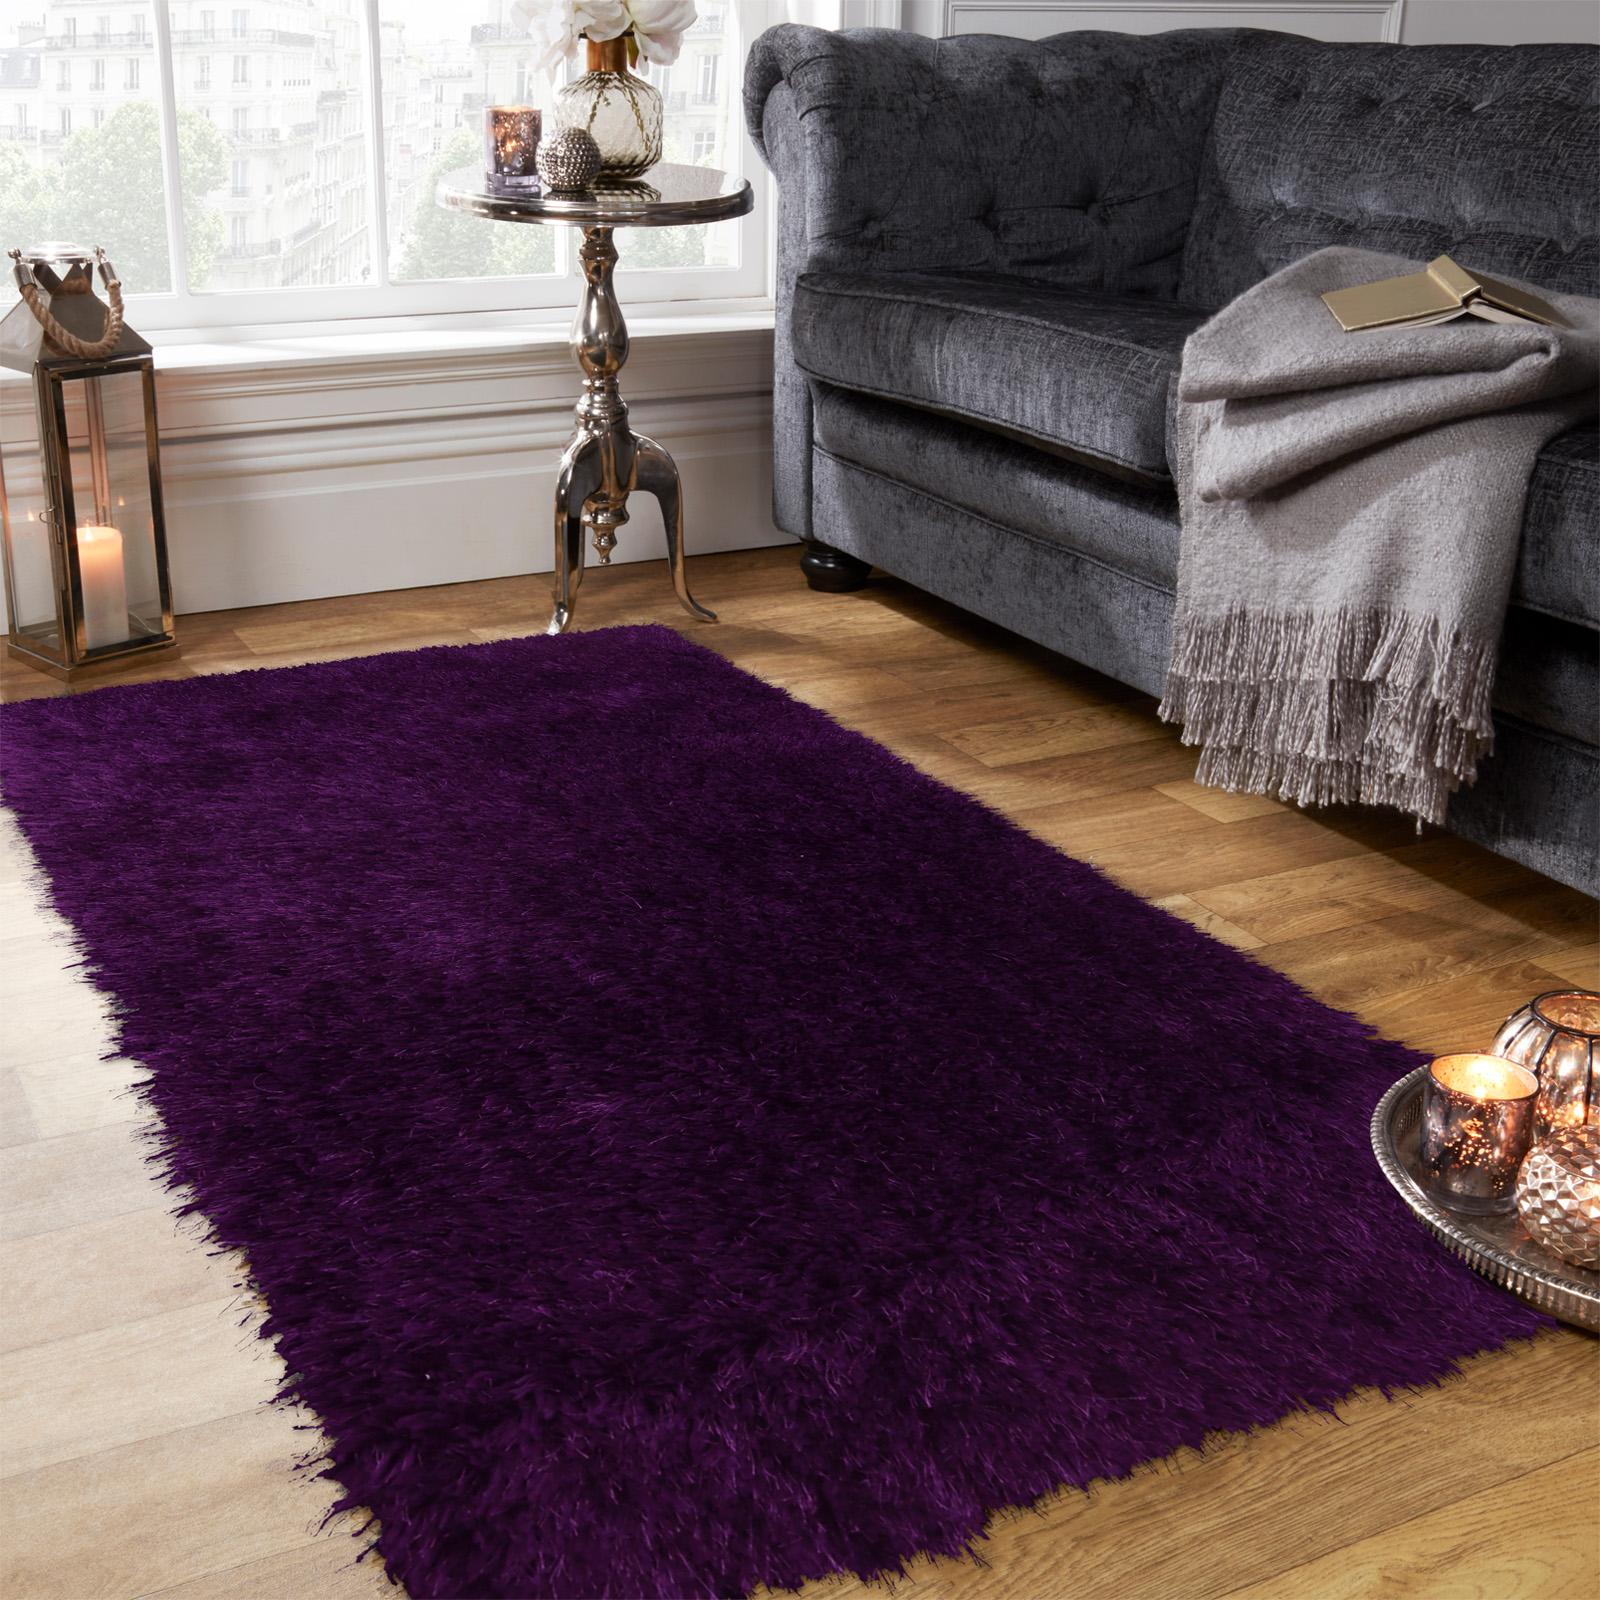 Sienna-Large-Shaggy-Floor-Rug-Plain-Soft-Sparkle-Area-Mat-5cm-Thick-Pile-Glitter thumbnail 20